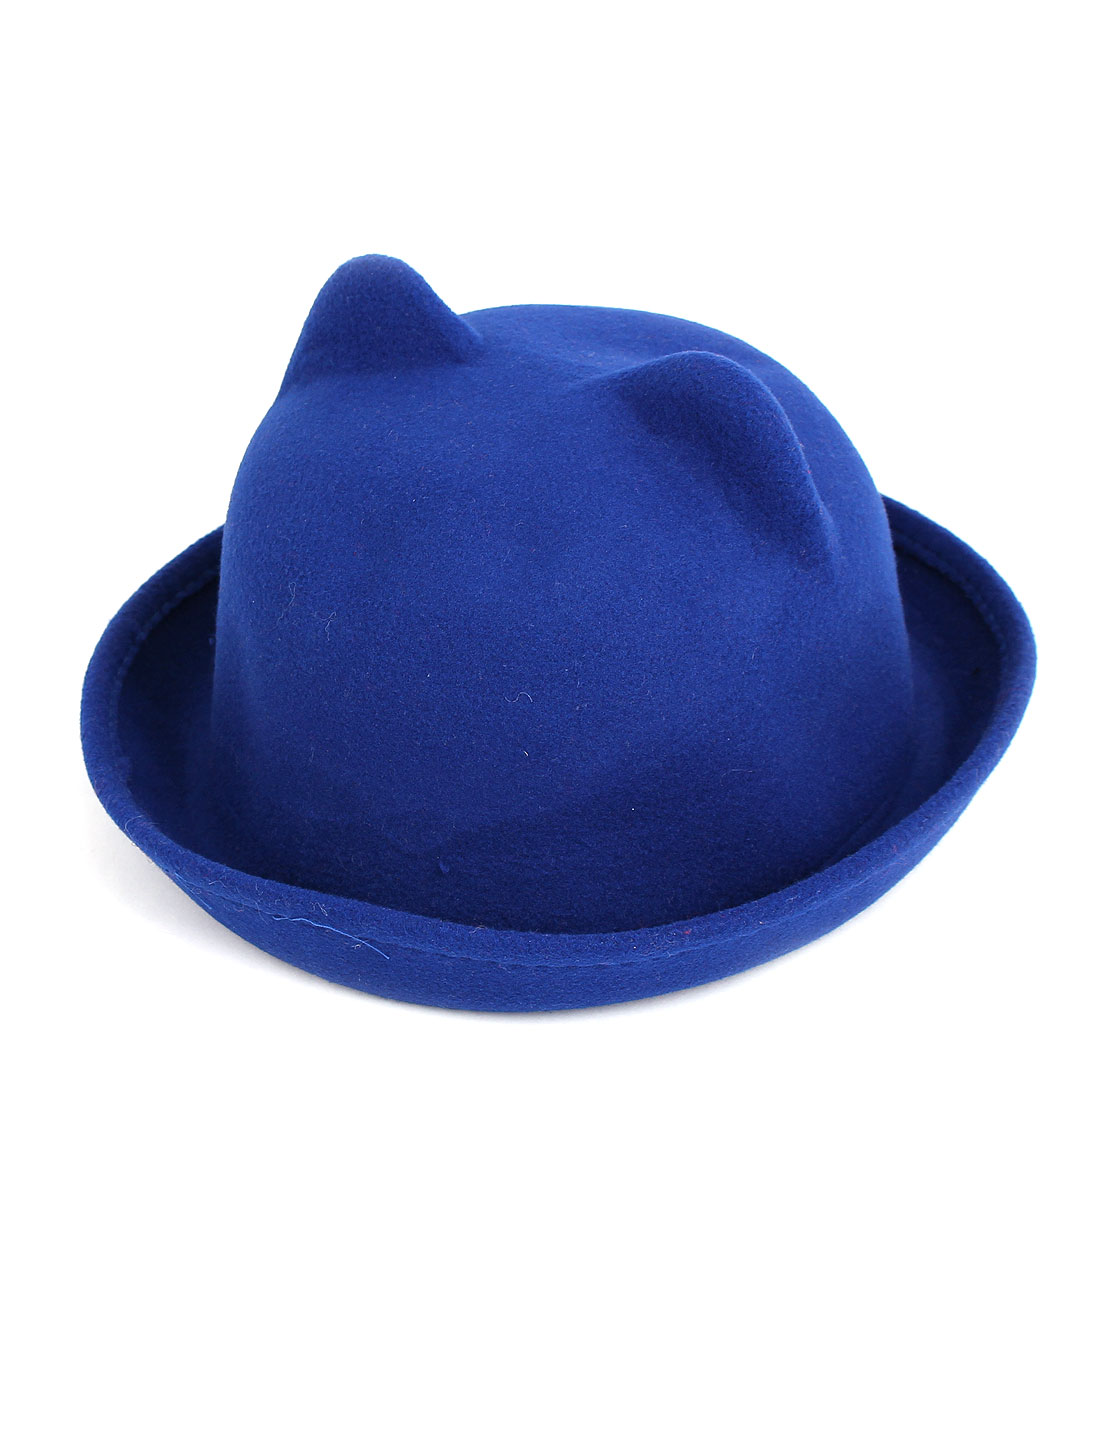 Girl Felt Cat Ear Design Short Brim Wedding Party Winter Bowler Hat Cap Royal Blue